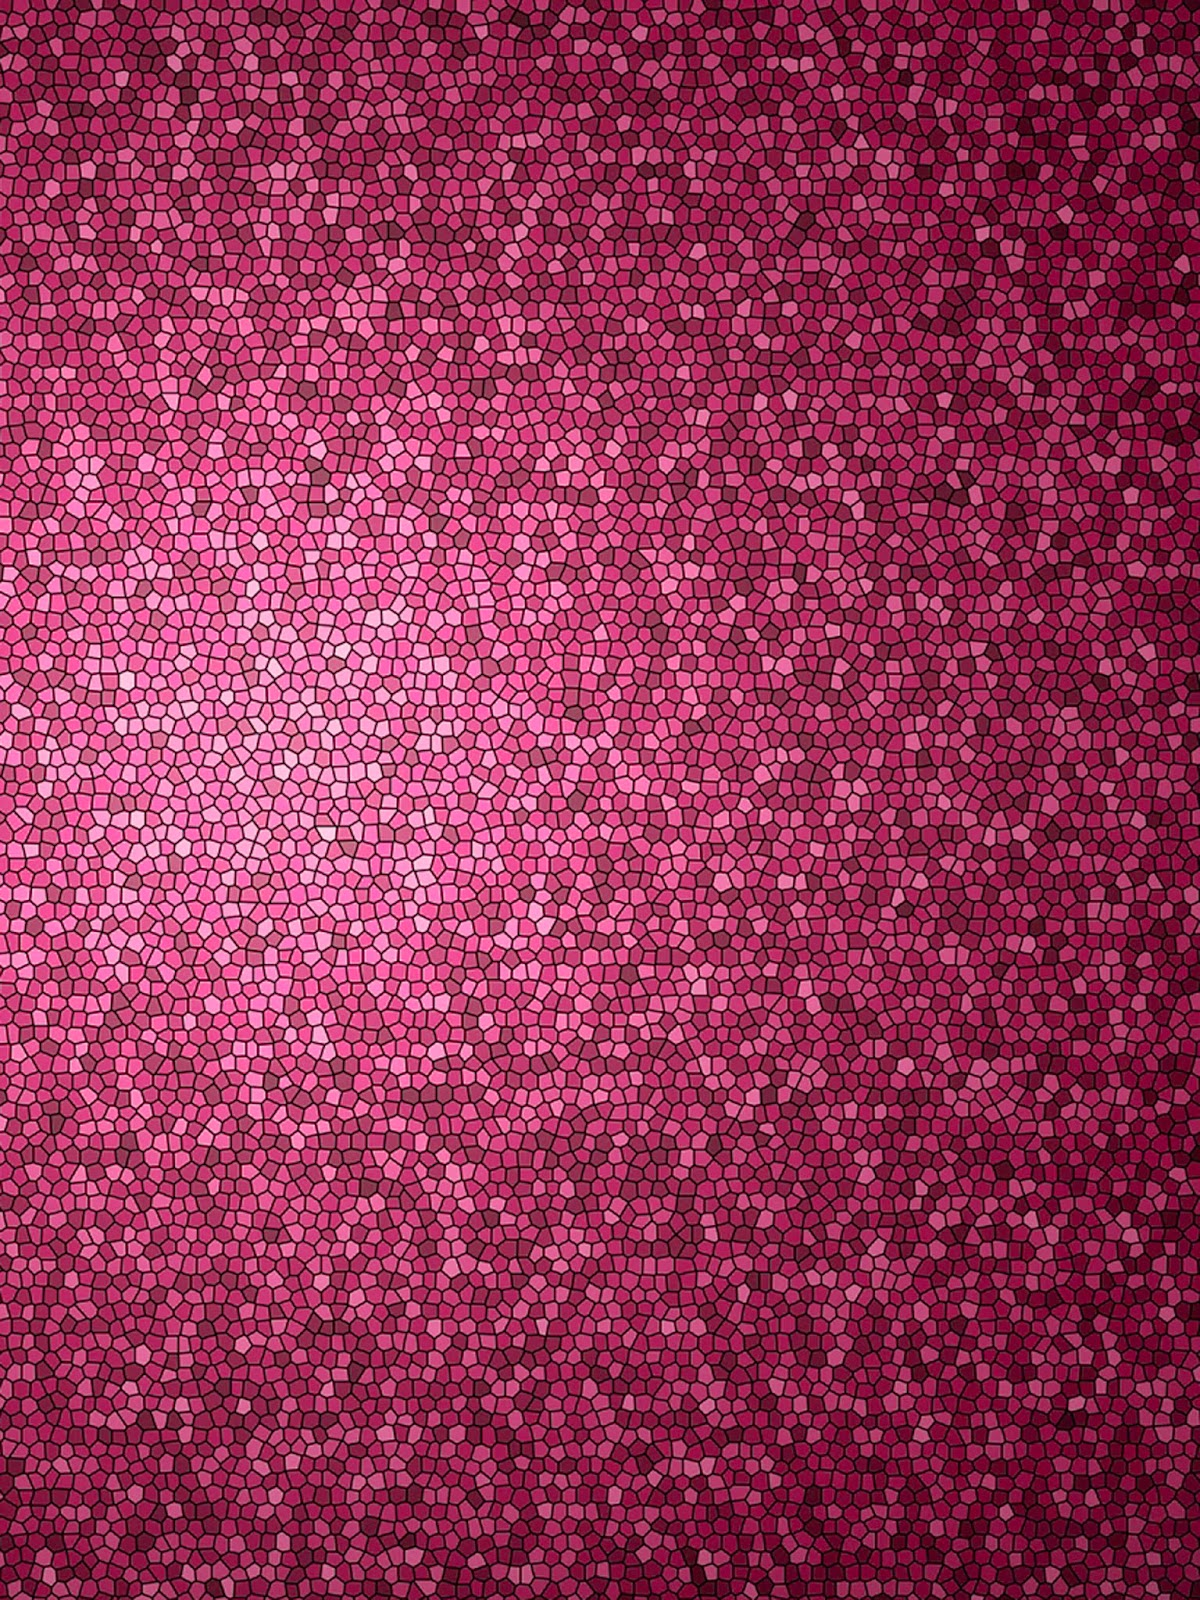 Geometric Mosaic Ombre Freebie Background Pattern